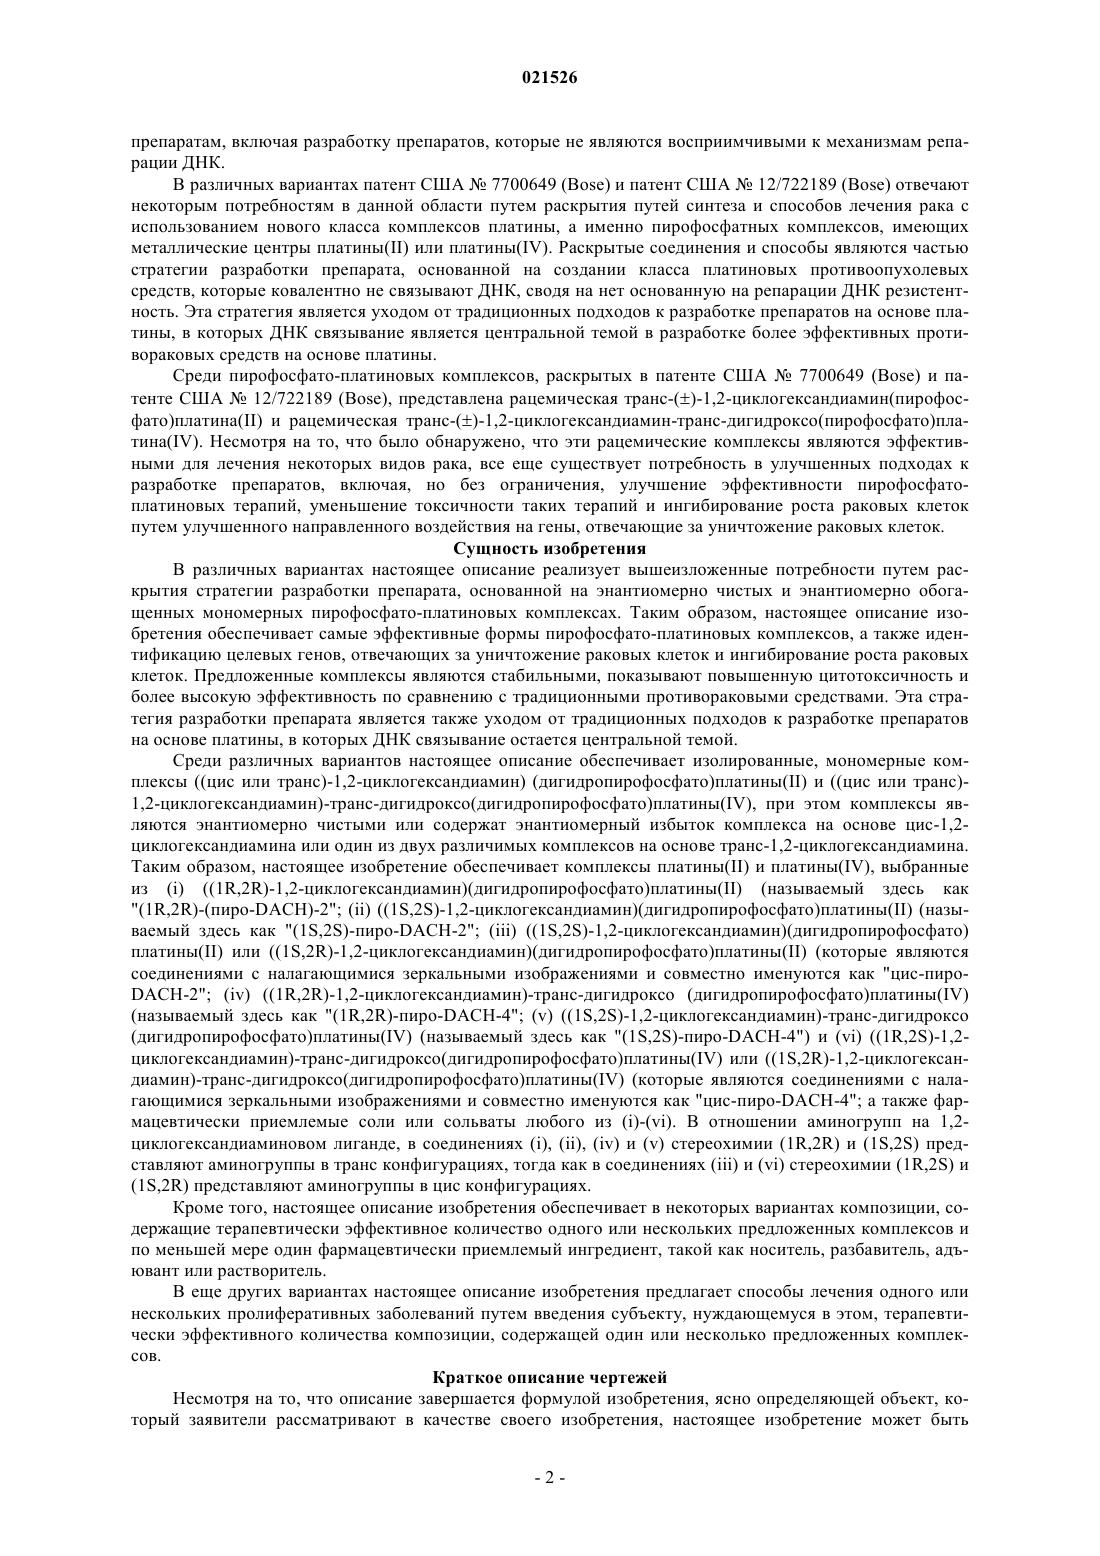 Клоразепат Калия